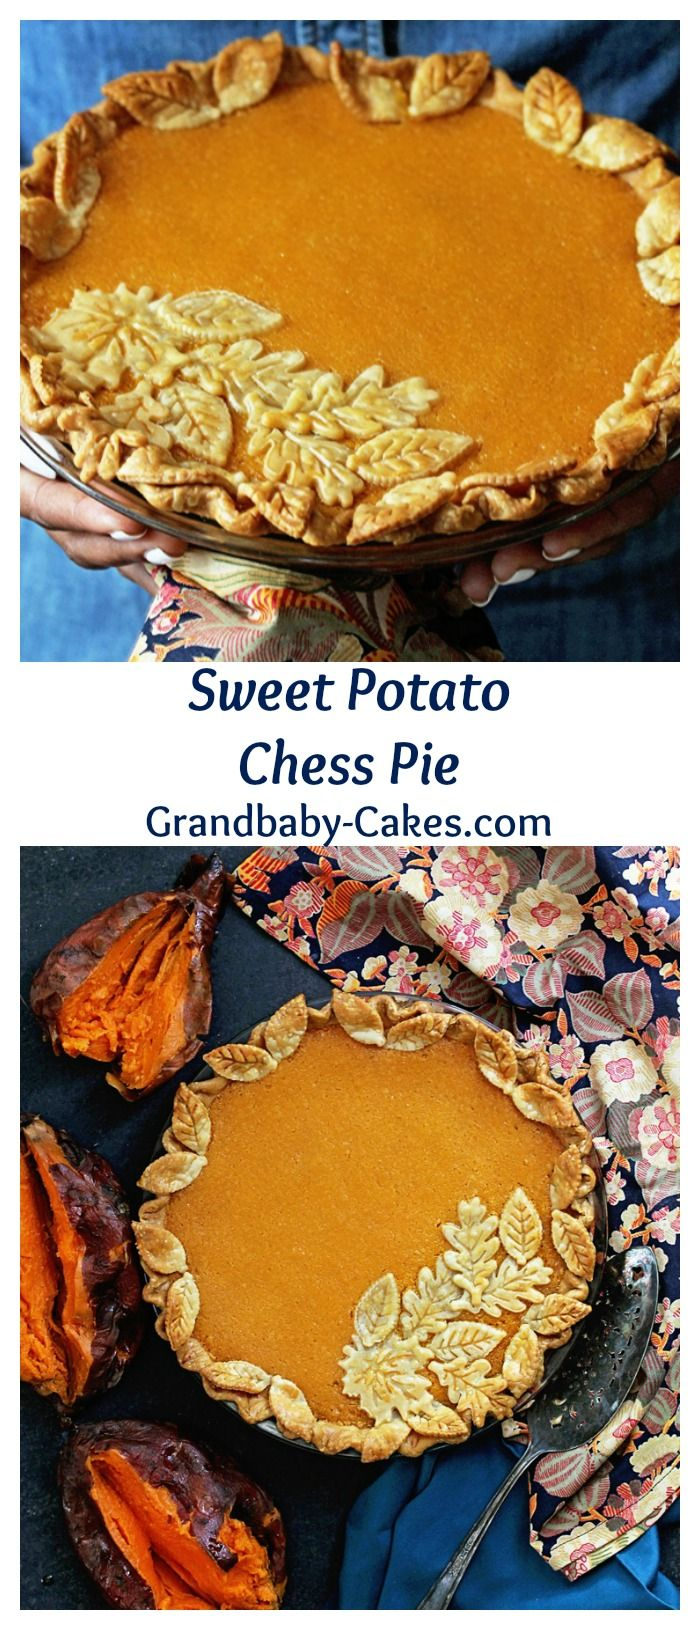 Sweet Potato Chess Pie - A spin on the classic! | Grandbaby-Cakes.com